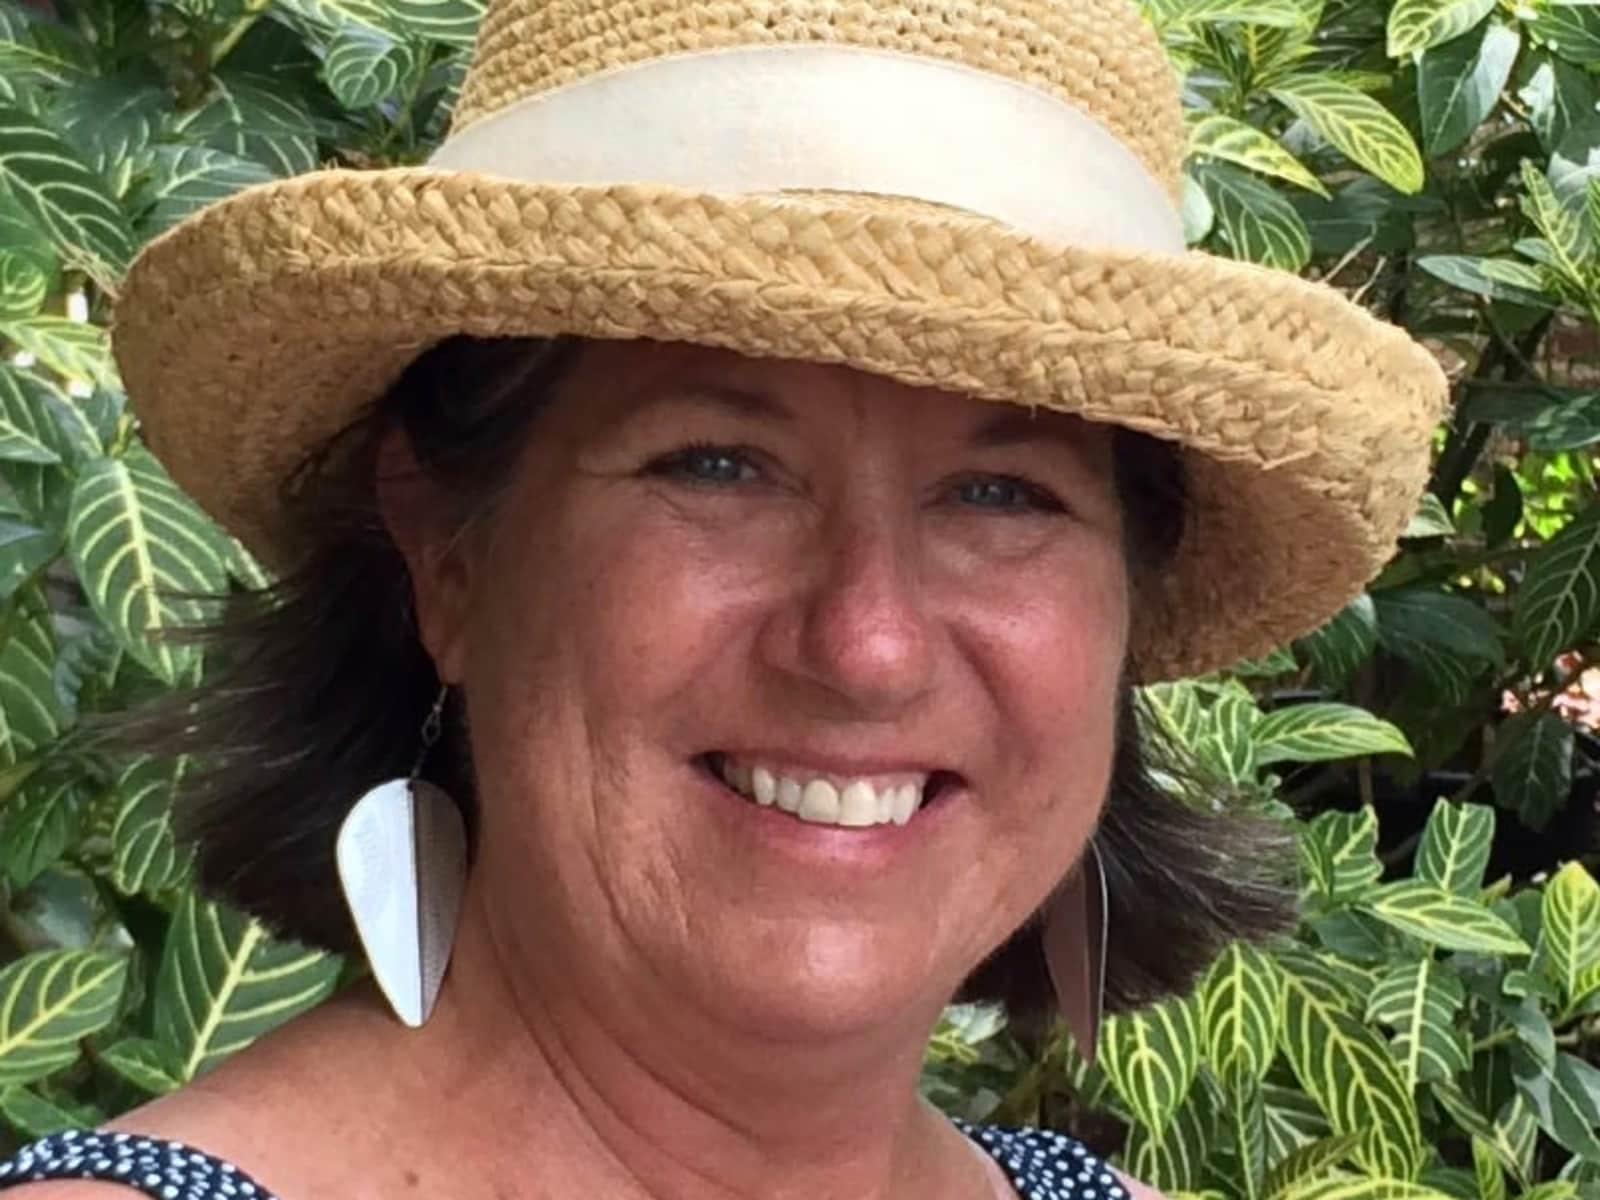 Ann from Bath, Pennsylvania, United States